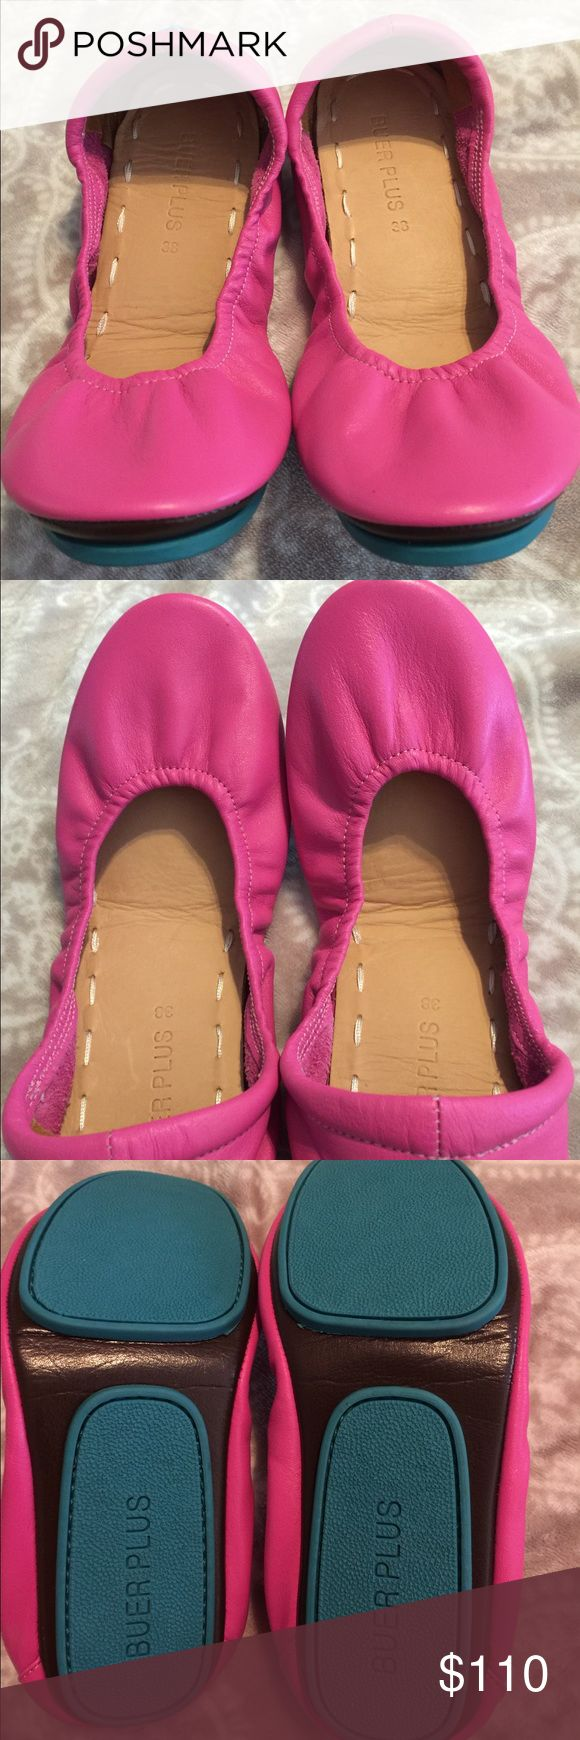 Buer Plus Pink Ballet Flats 38/7- NOT Tieks New Tieks Shoes Flats & Loafers